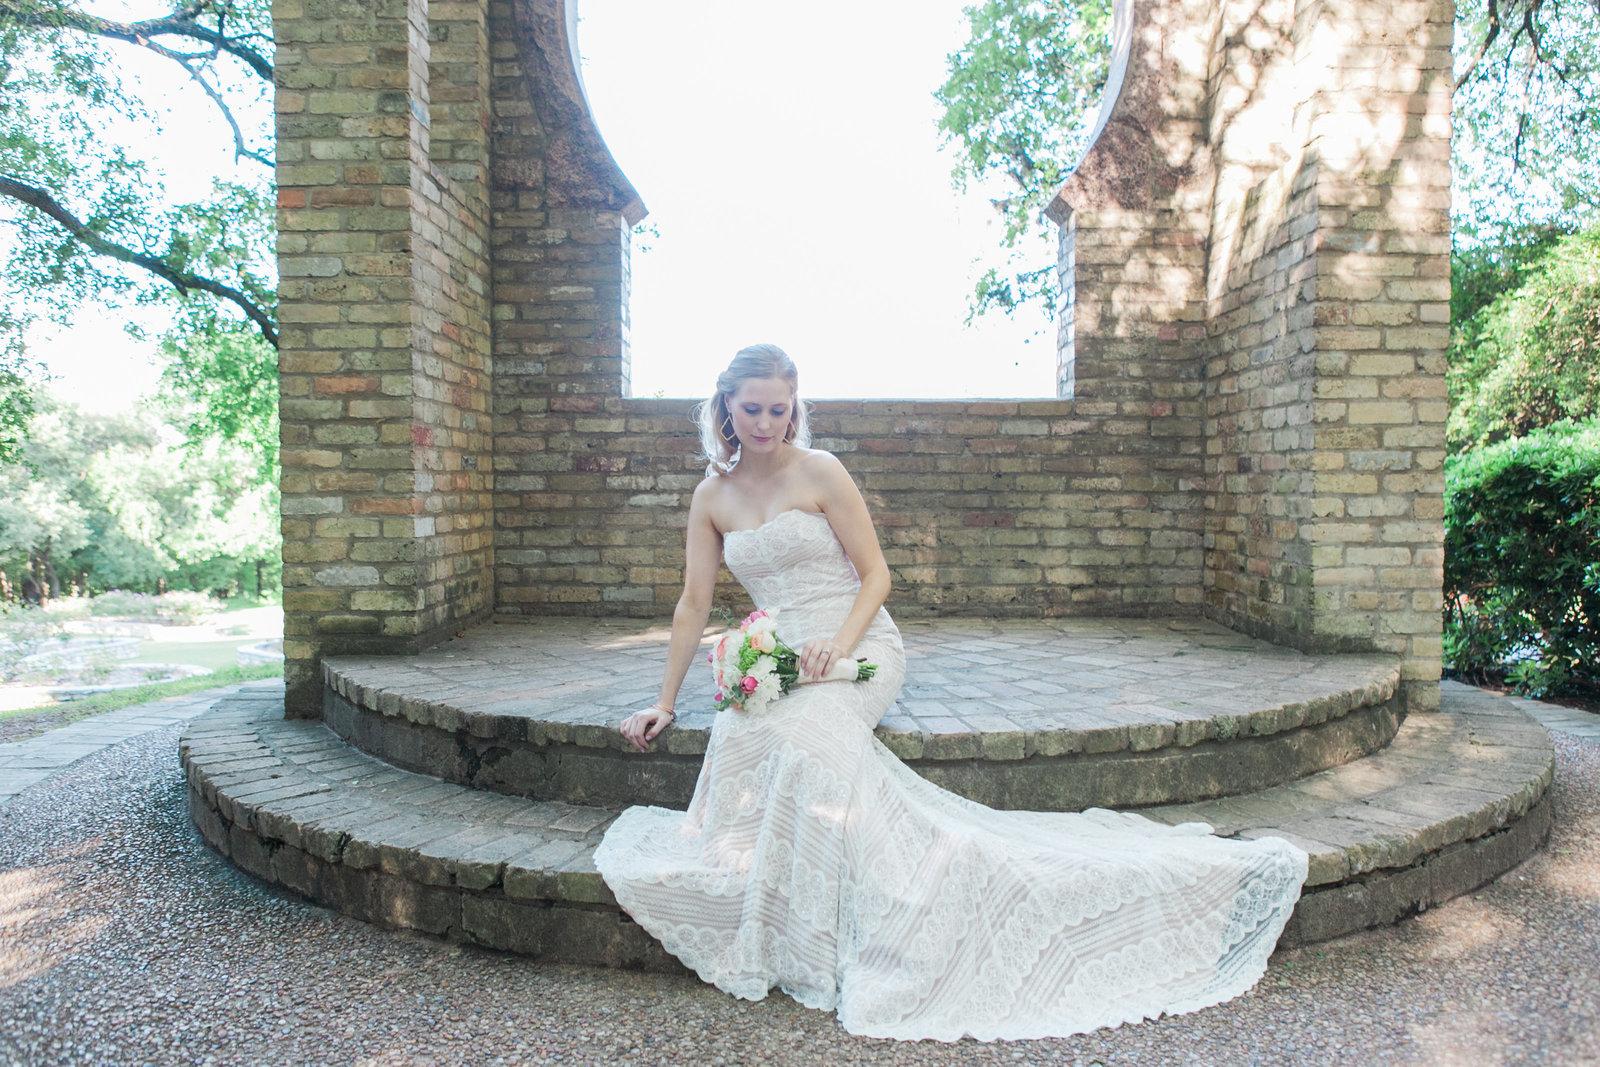 Austin Family Photographer, Tiffany Chapman, bridal portrait